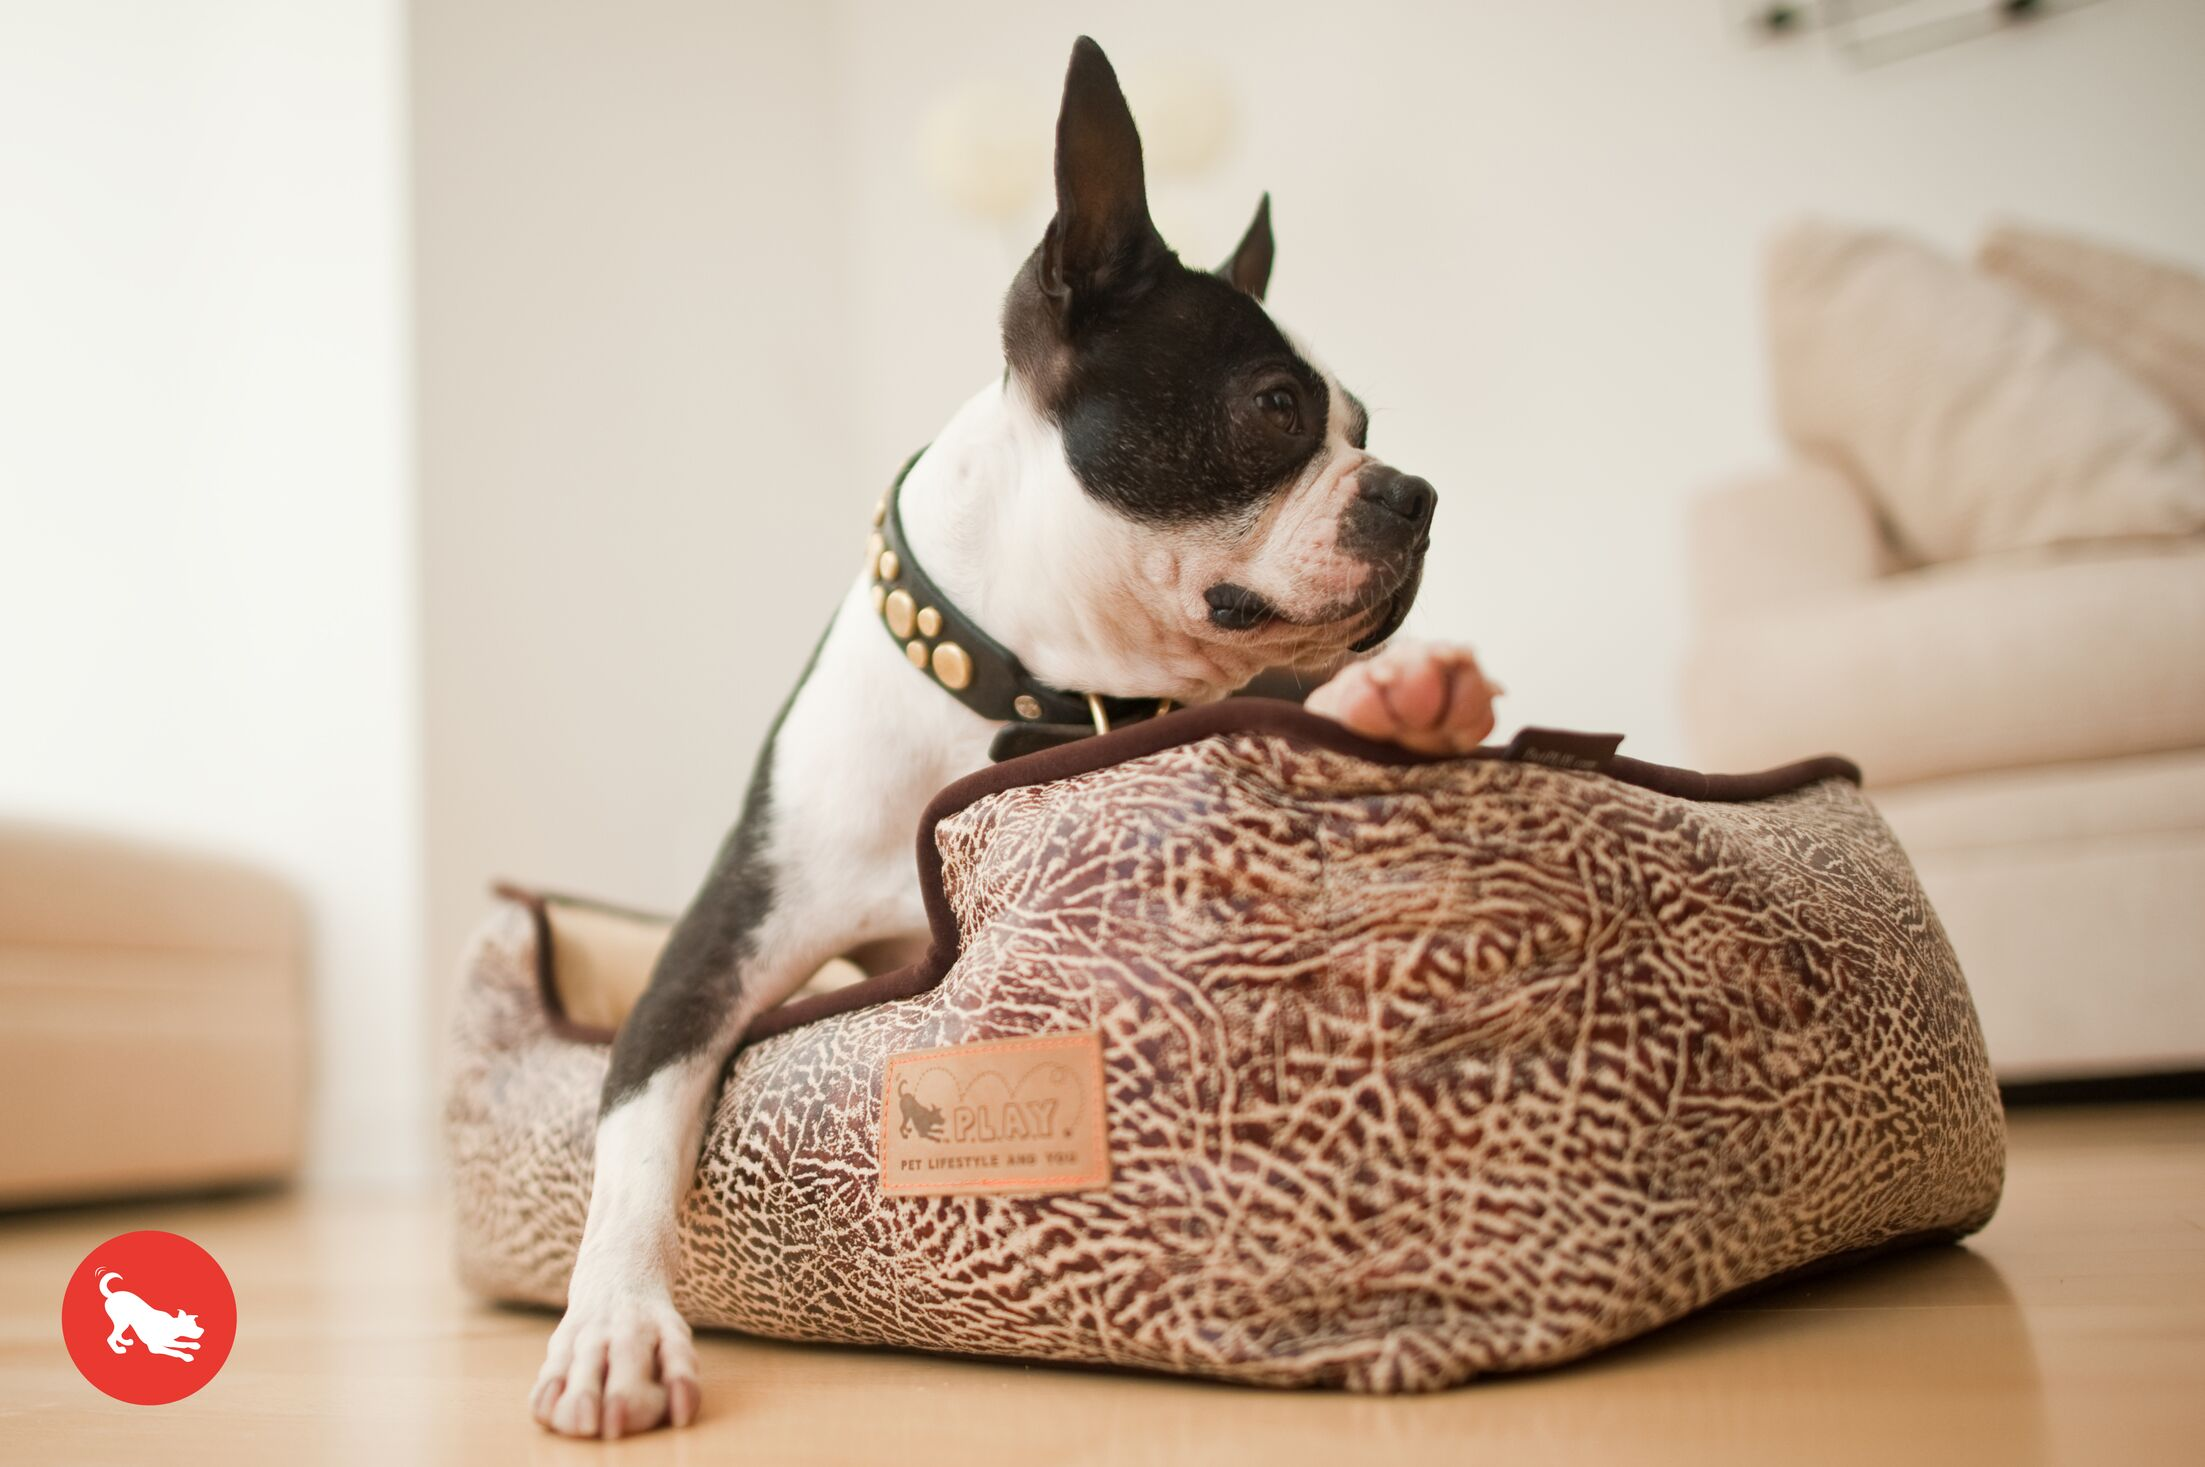 Original Savannah Lounge Dog Sofa Color: Sepia / Espresso, Size: Small (24